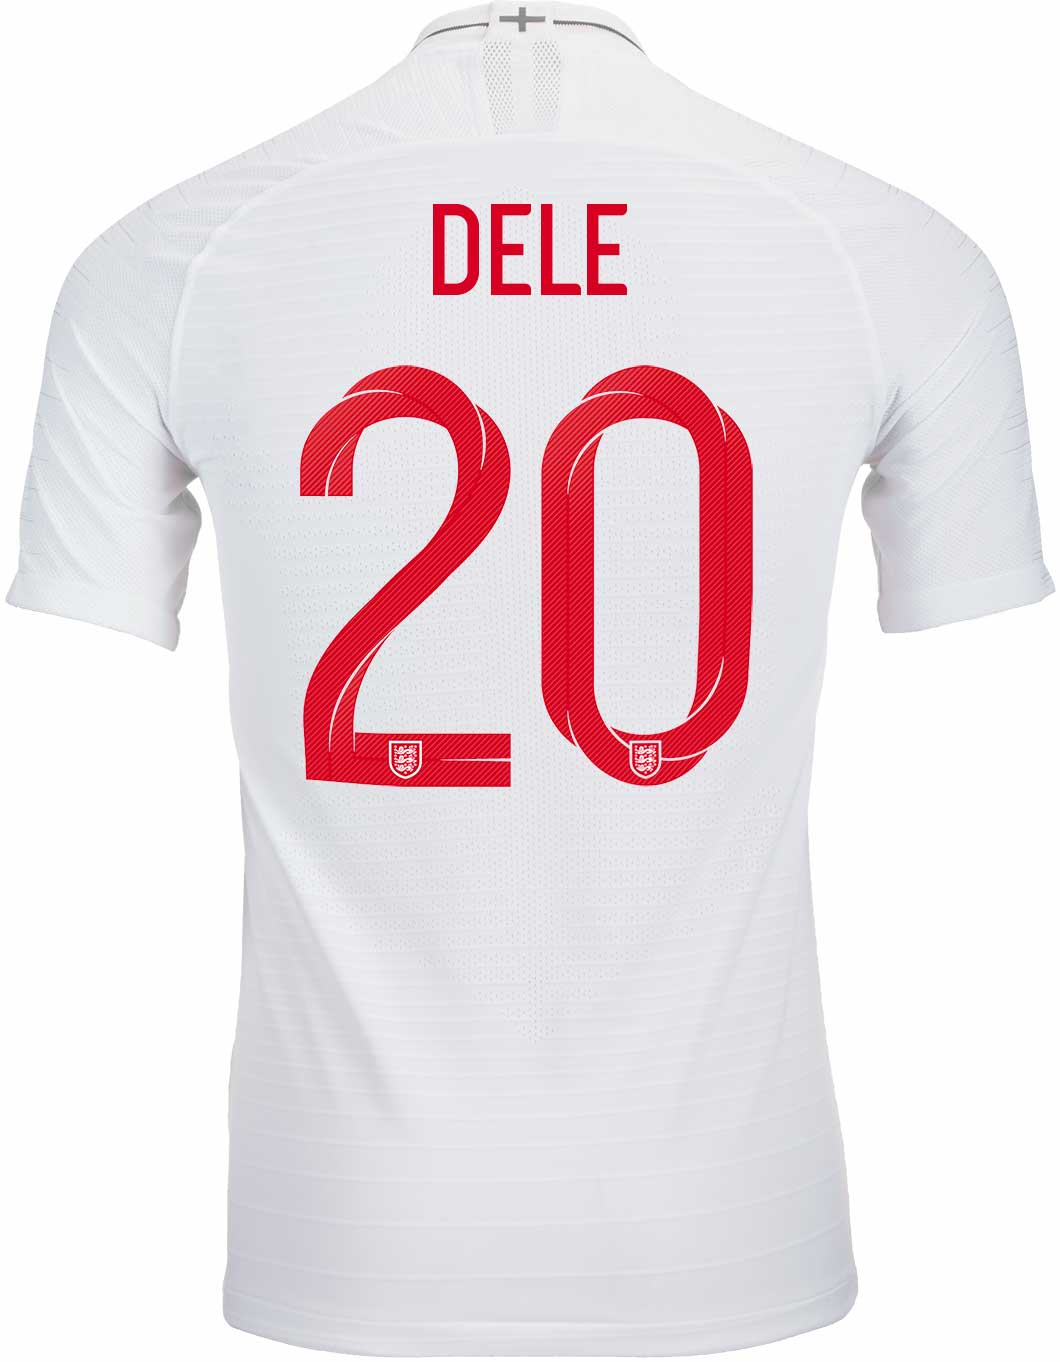 timeless design 70312 34594 2018/19 Nike Dele Alli England Home Match Jersey - SoccerPro